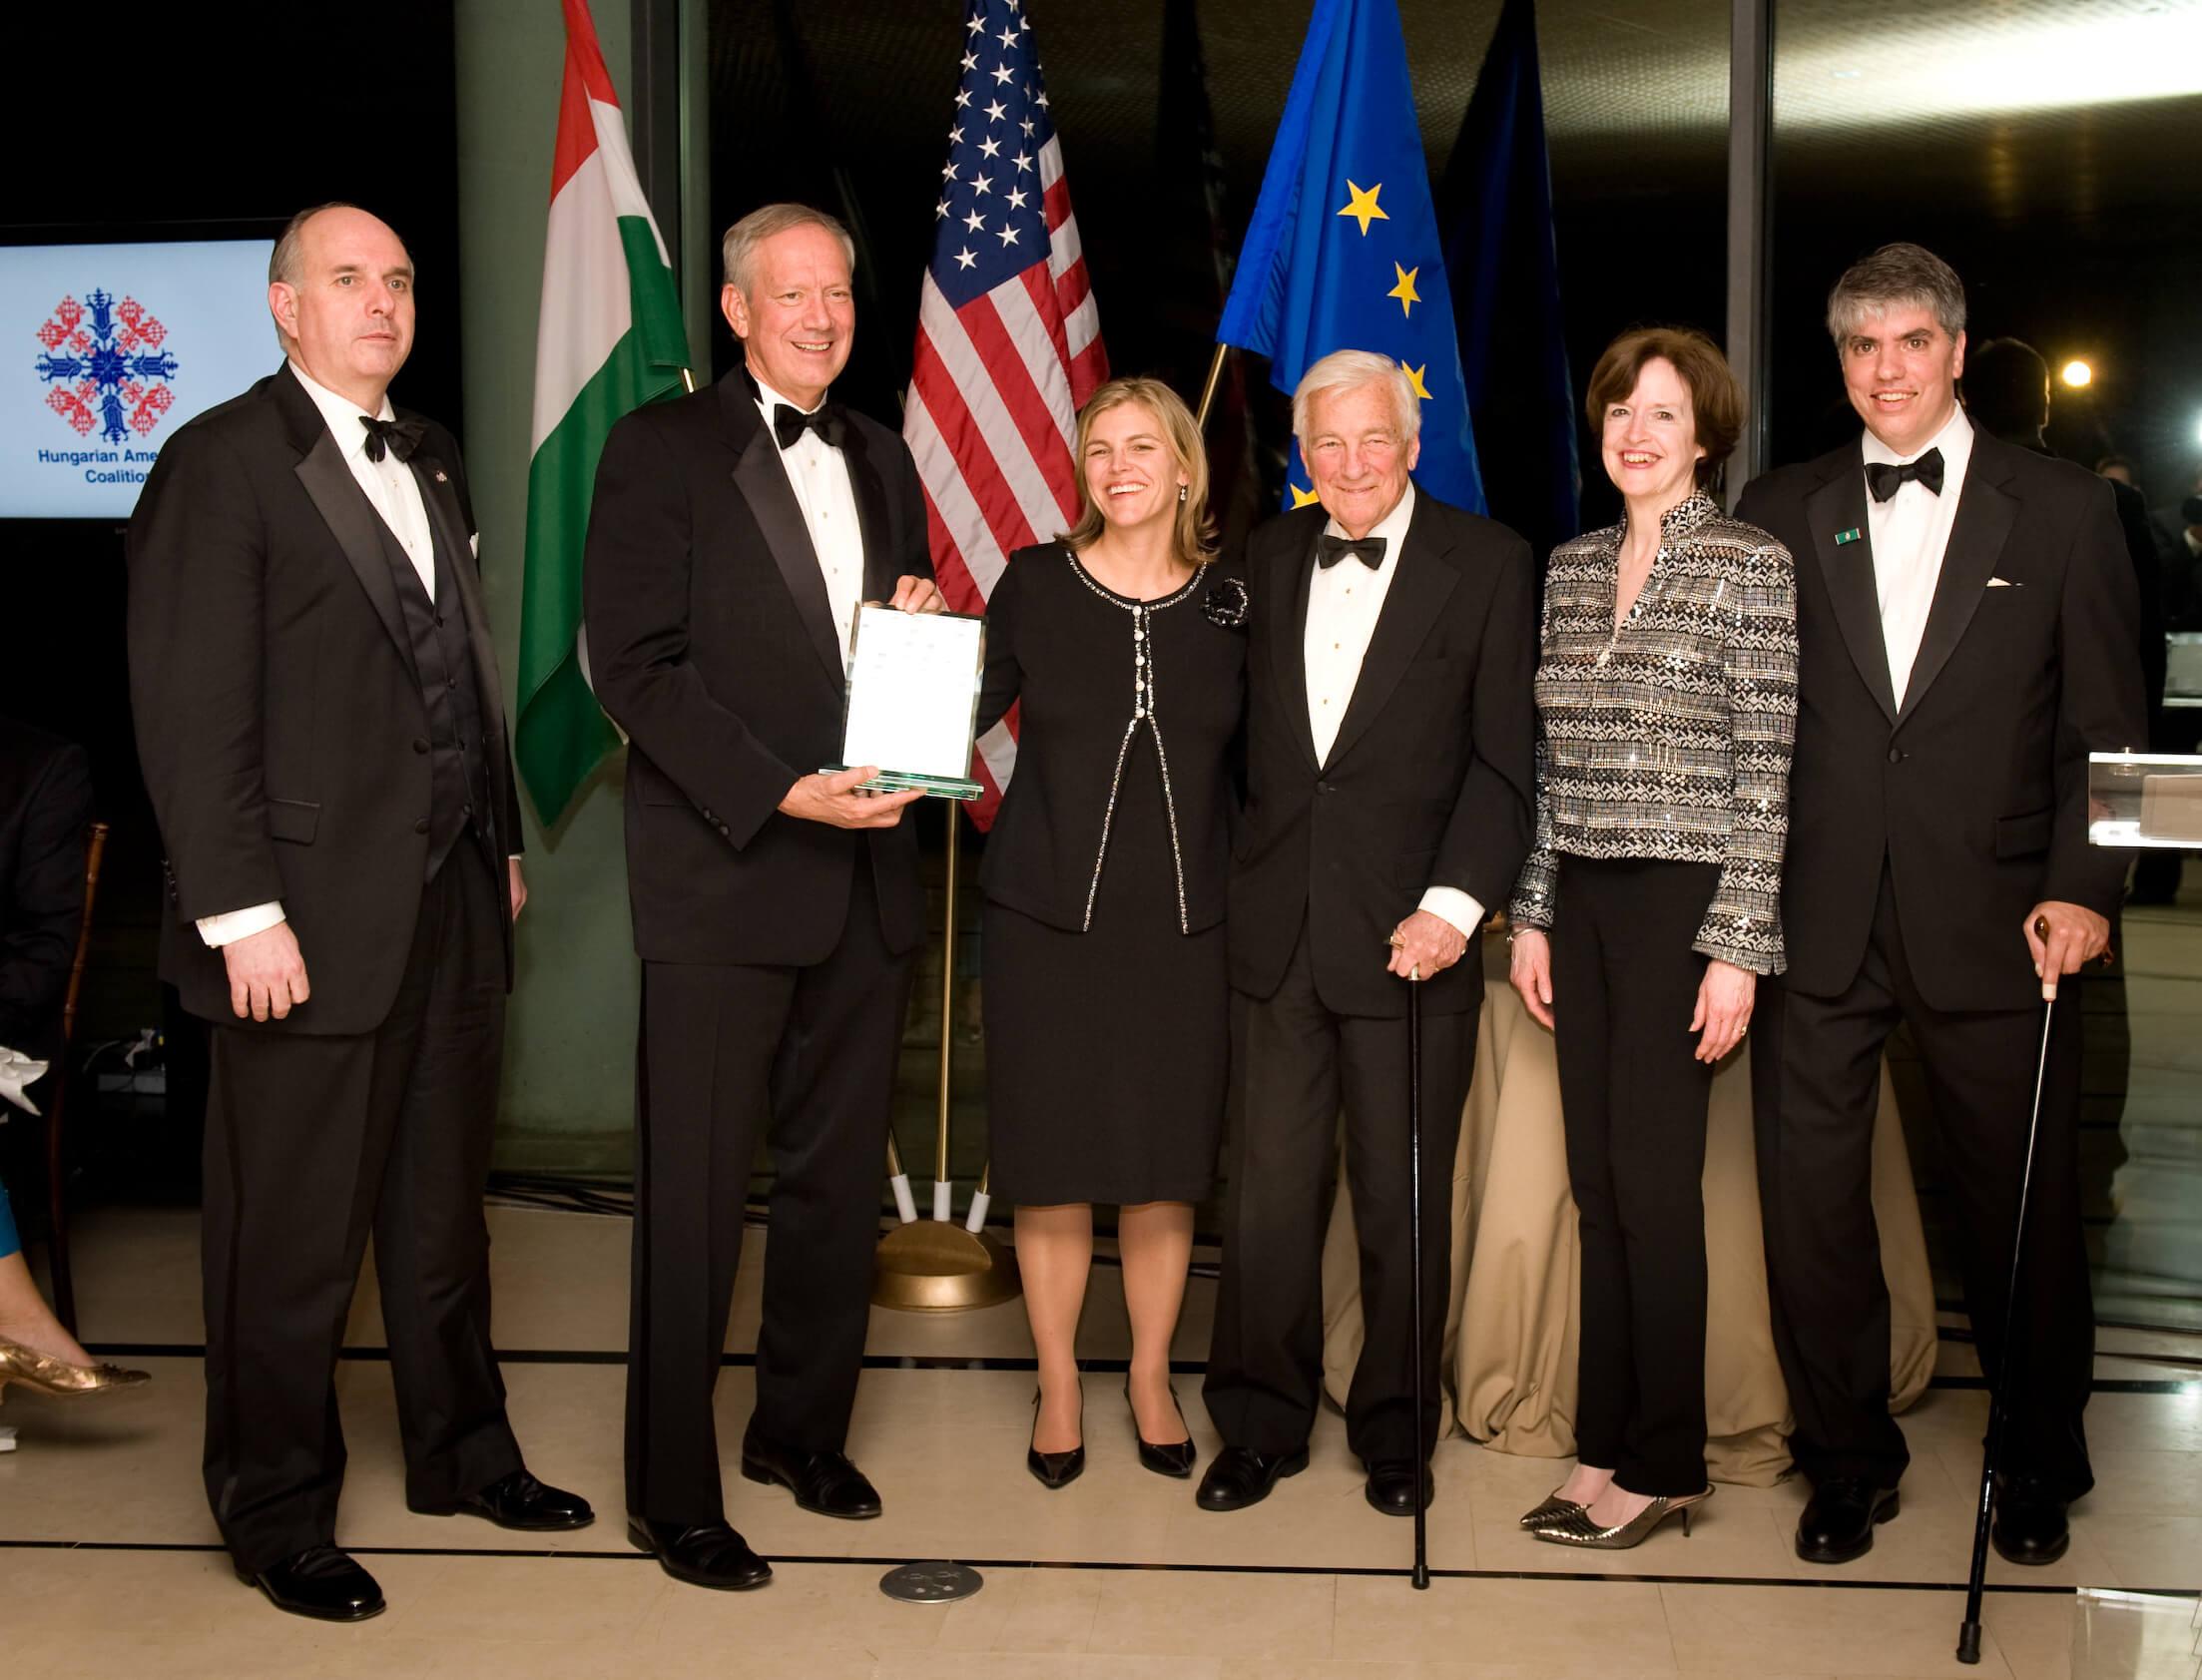 Stephen J. Varga, Governor George Pataki, Andrea Lauer Rice, John C. Whitehead, Ambassador April Foley and Maximilian Teleki